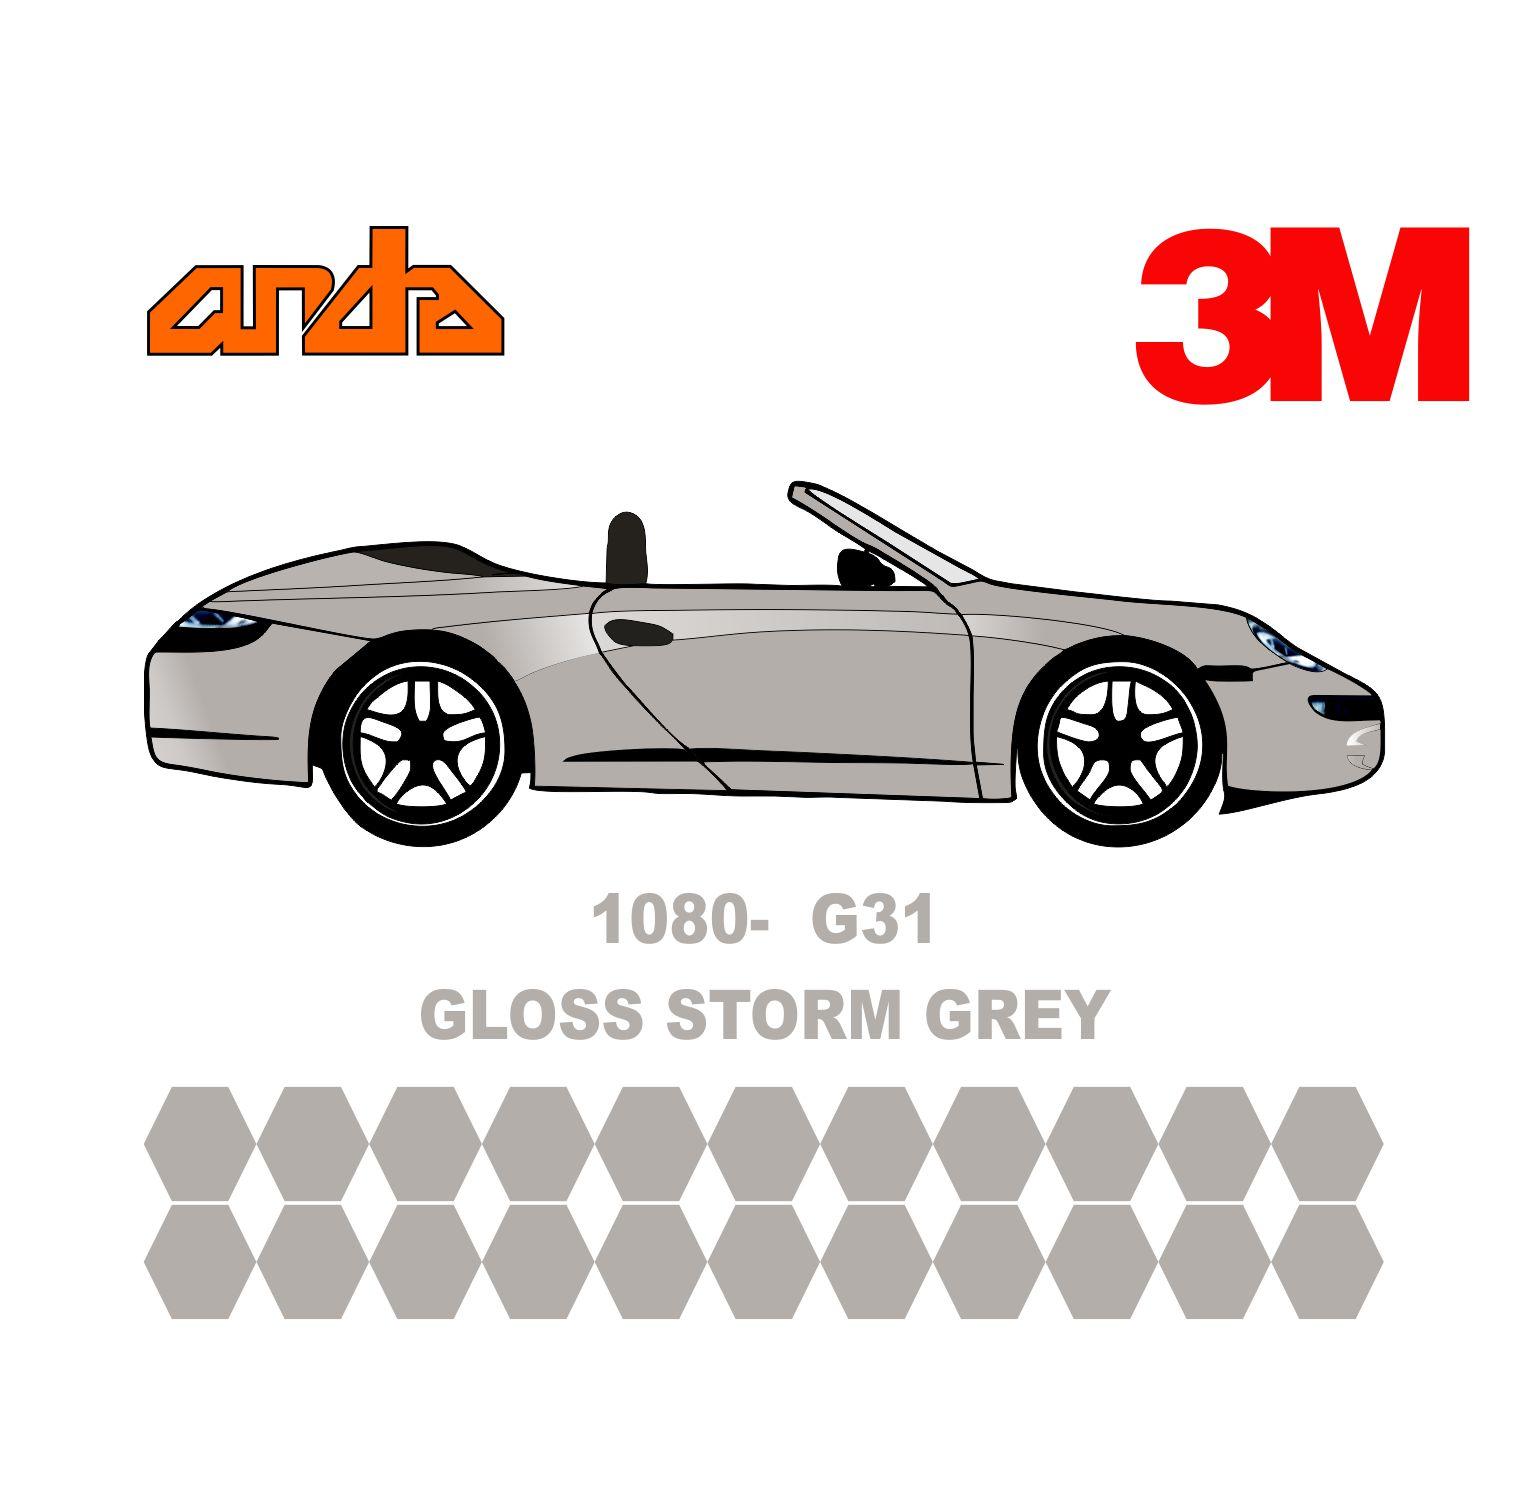 3M 1080-G31 Parlak Fırtına Gri 1